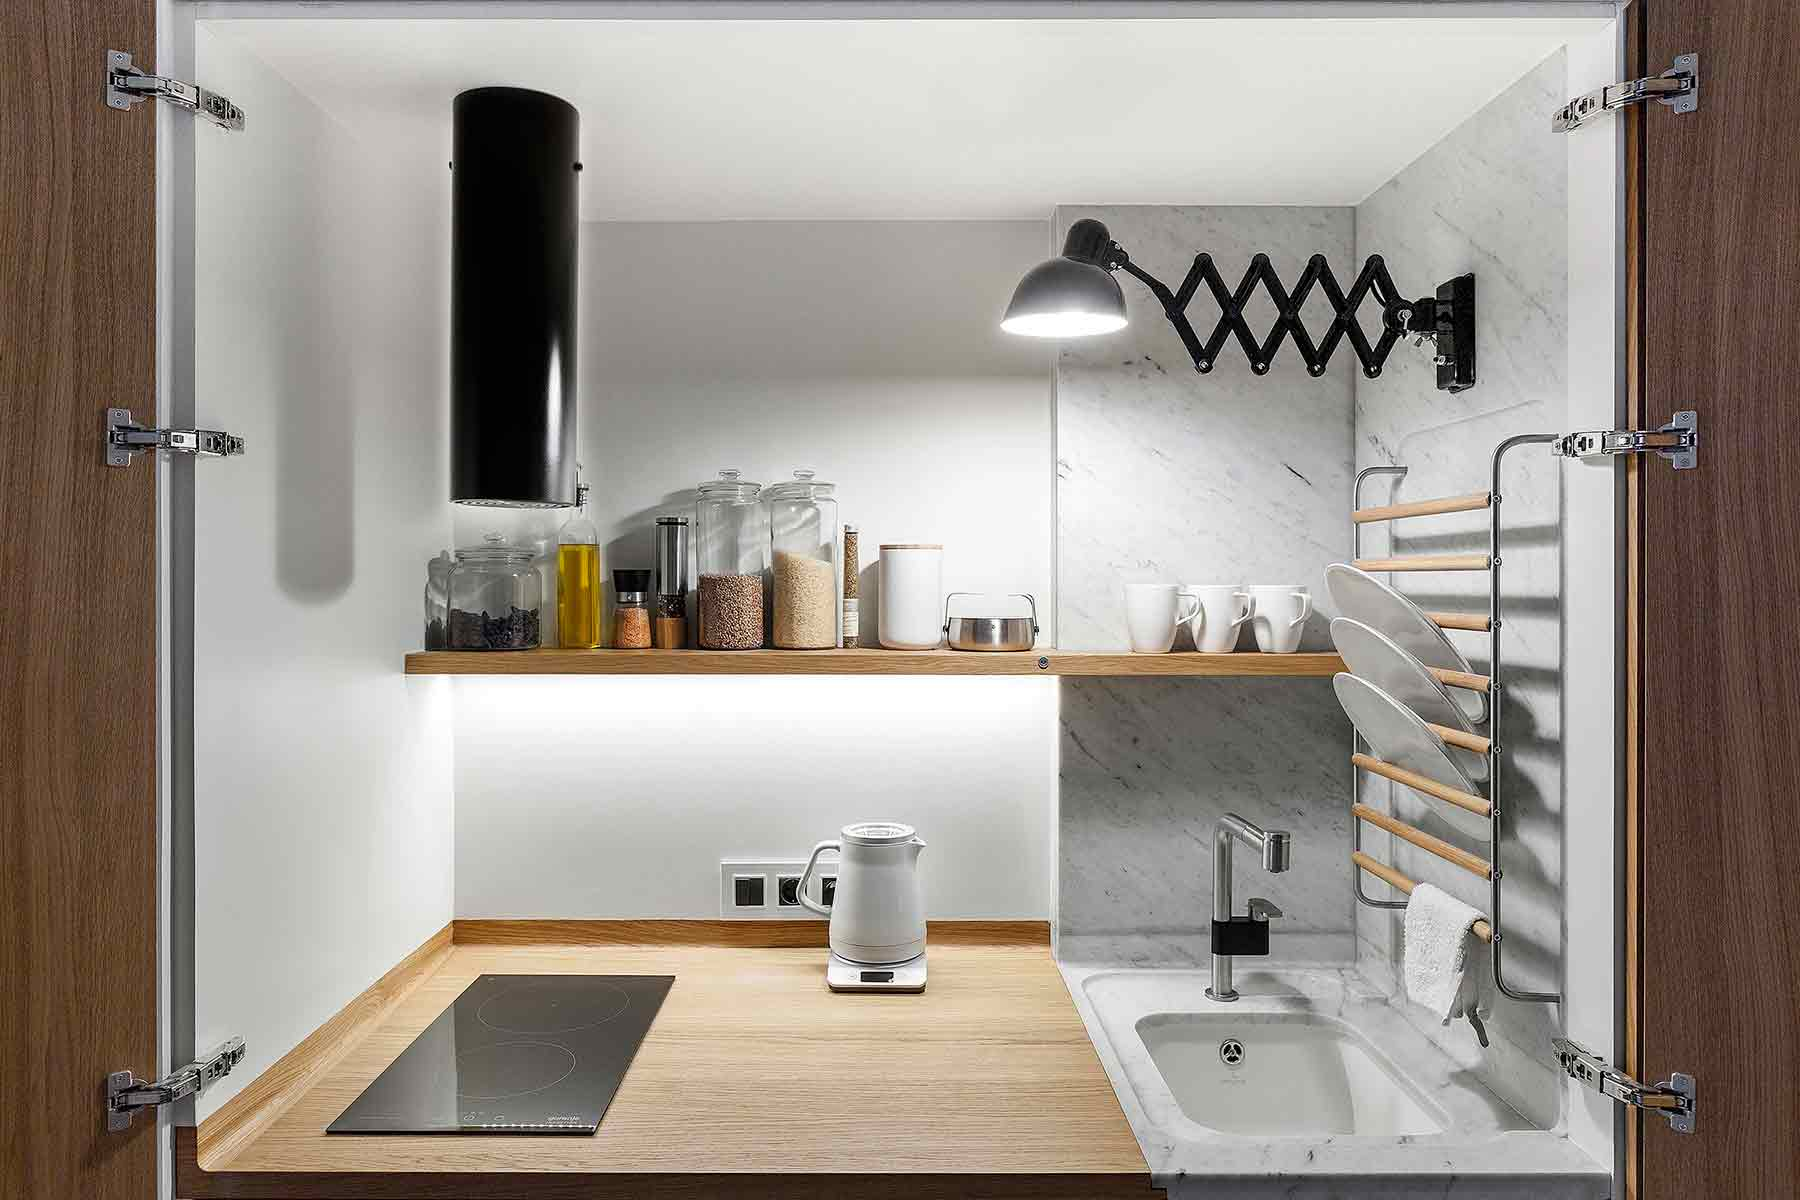 Dapur compact yang efisien karya studio Bazi, via organized-home.com